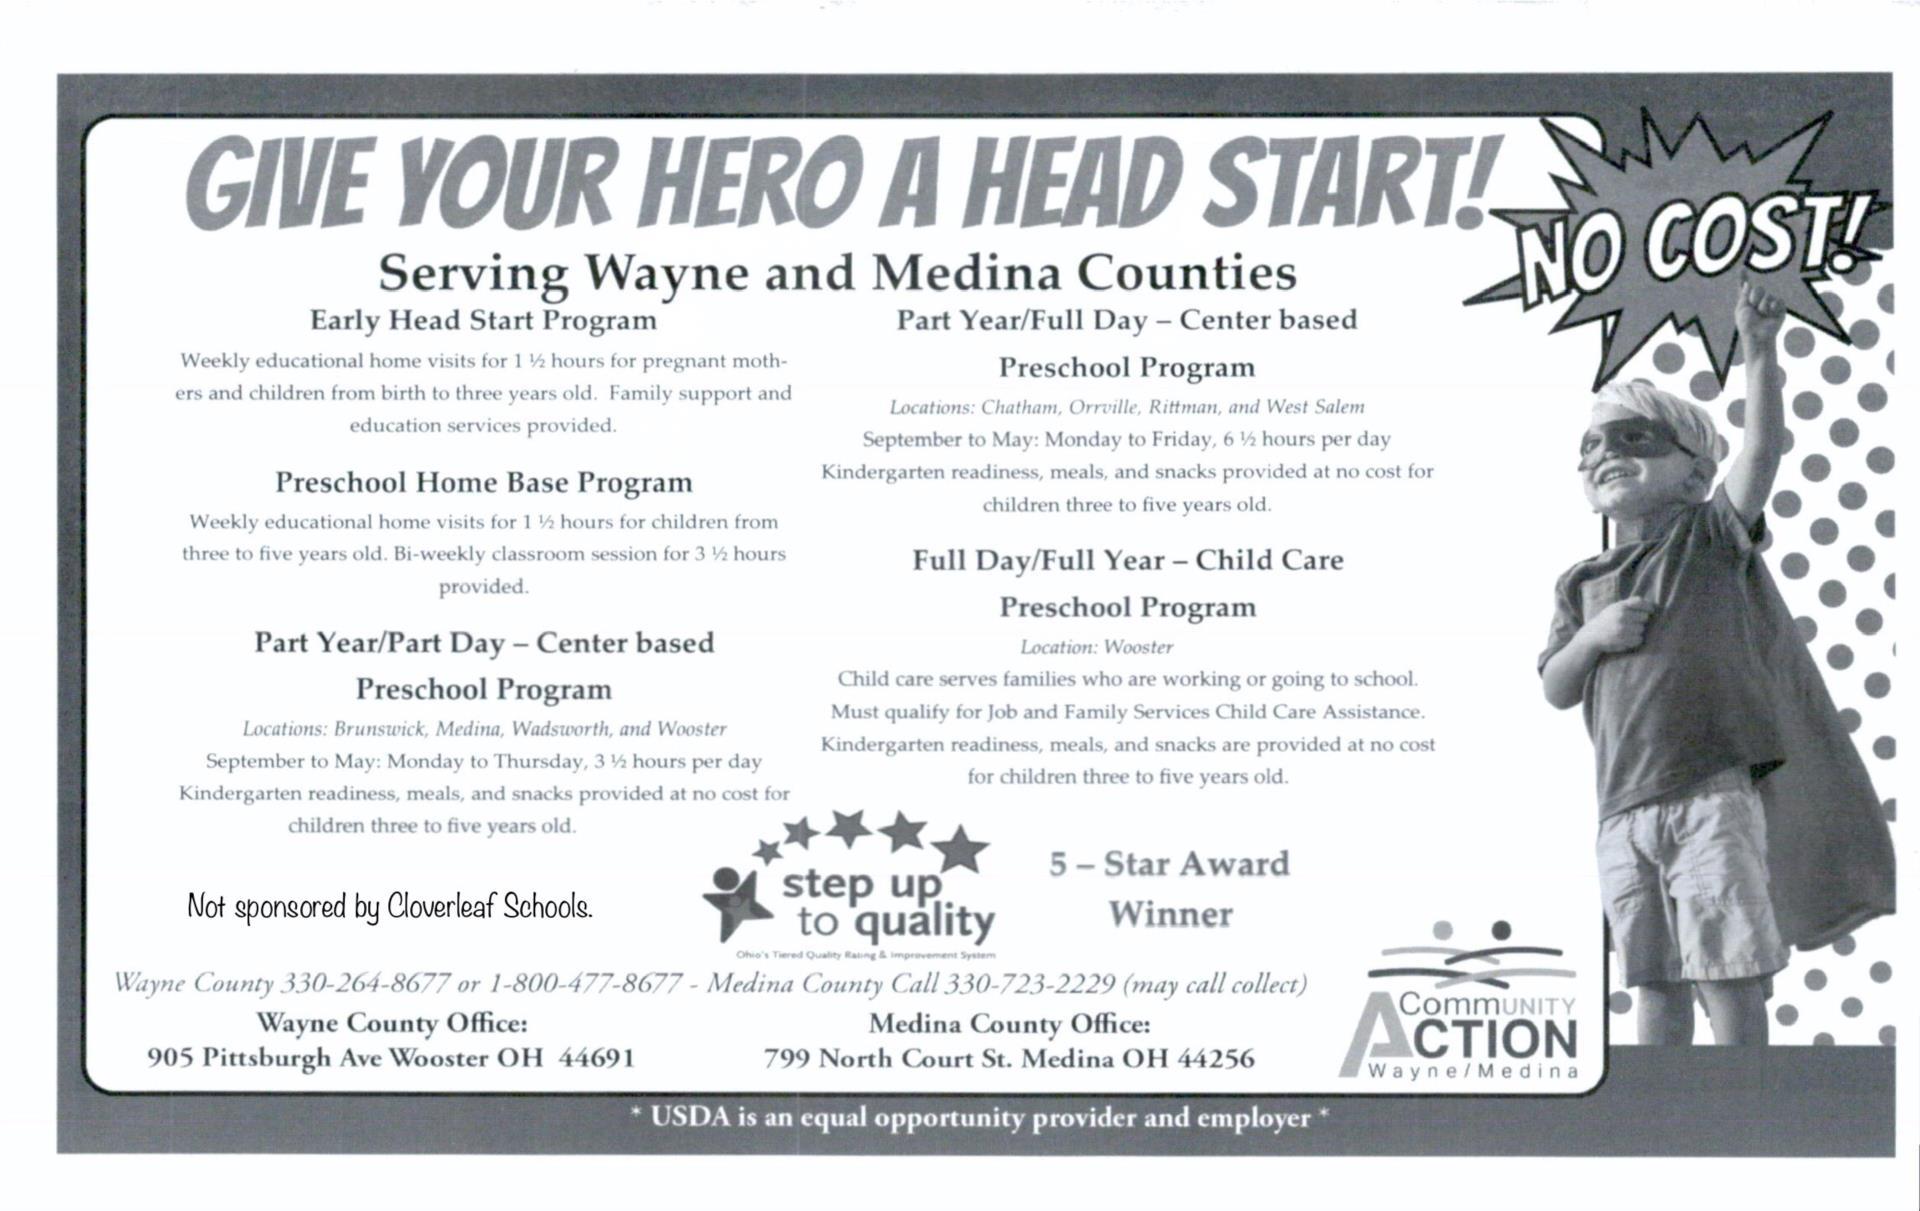 Informational flyer for Wayne-Medina Head Start program